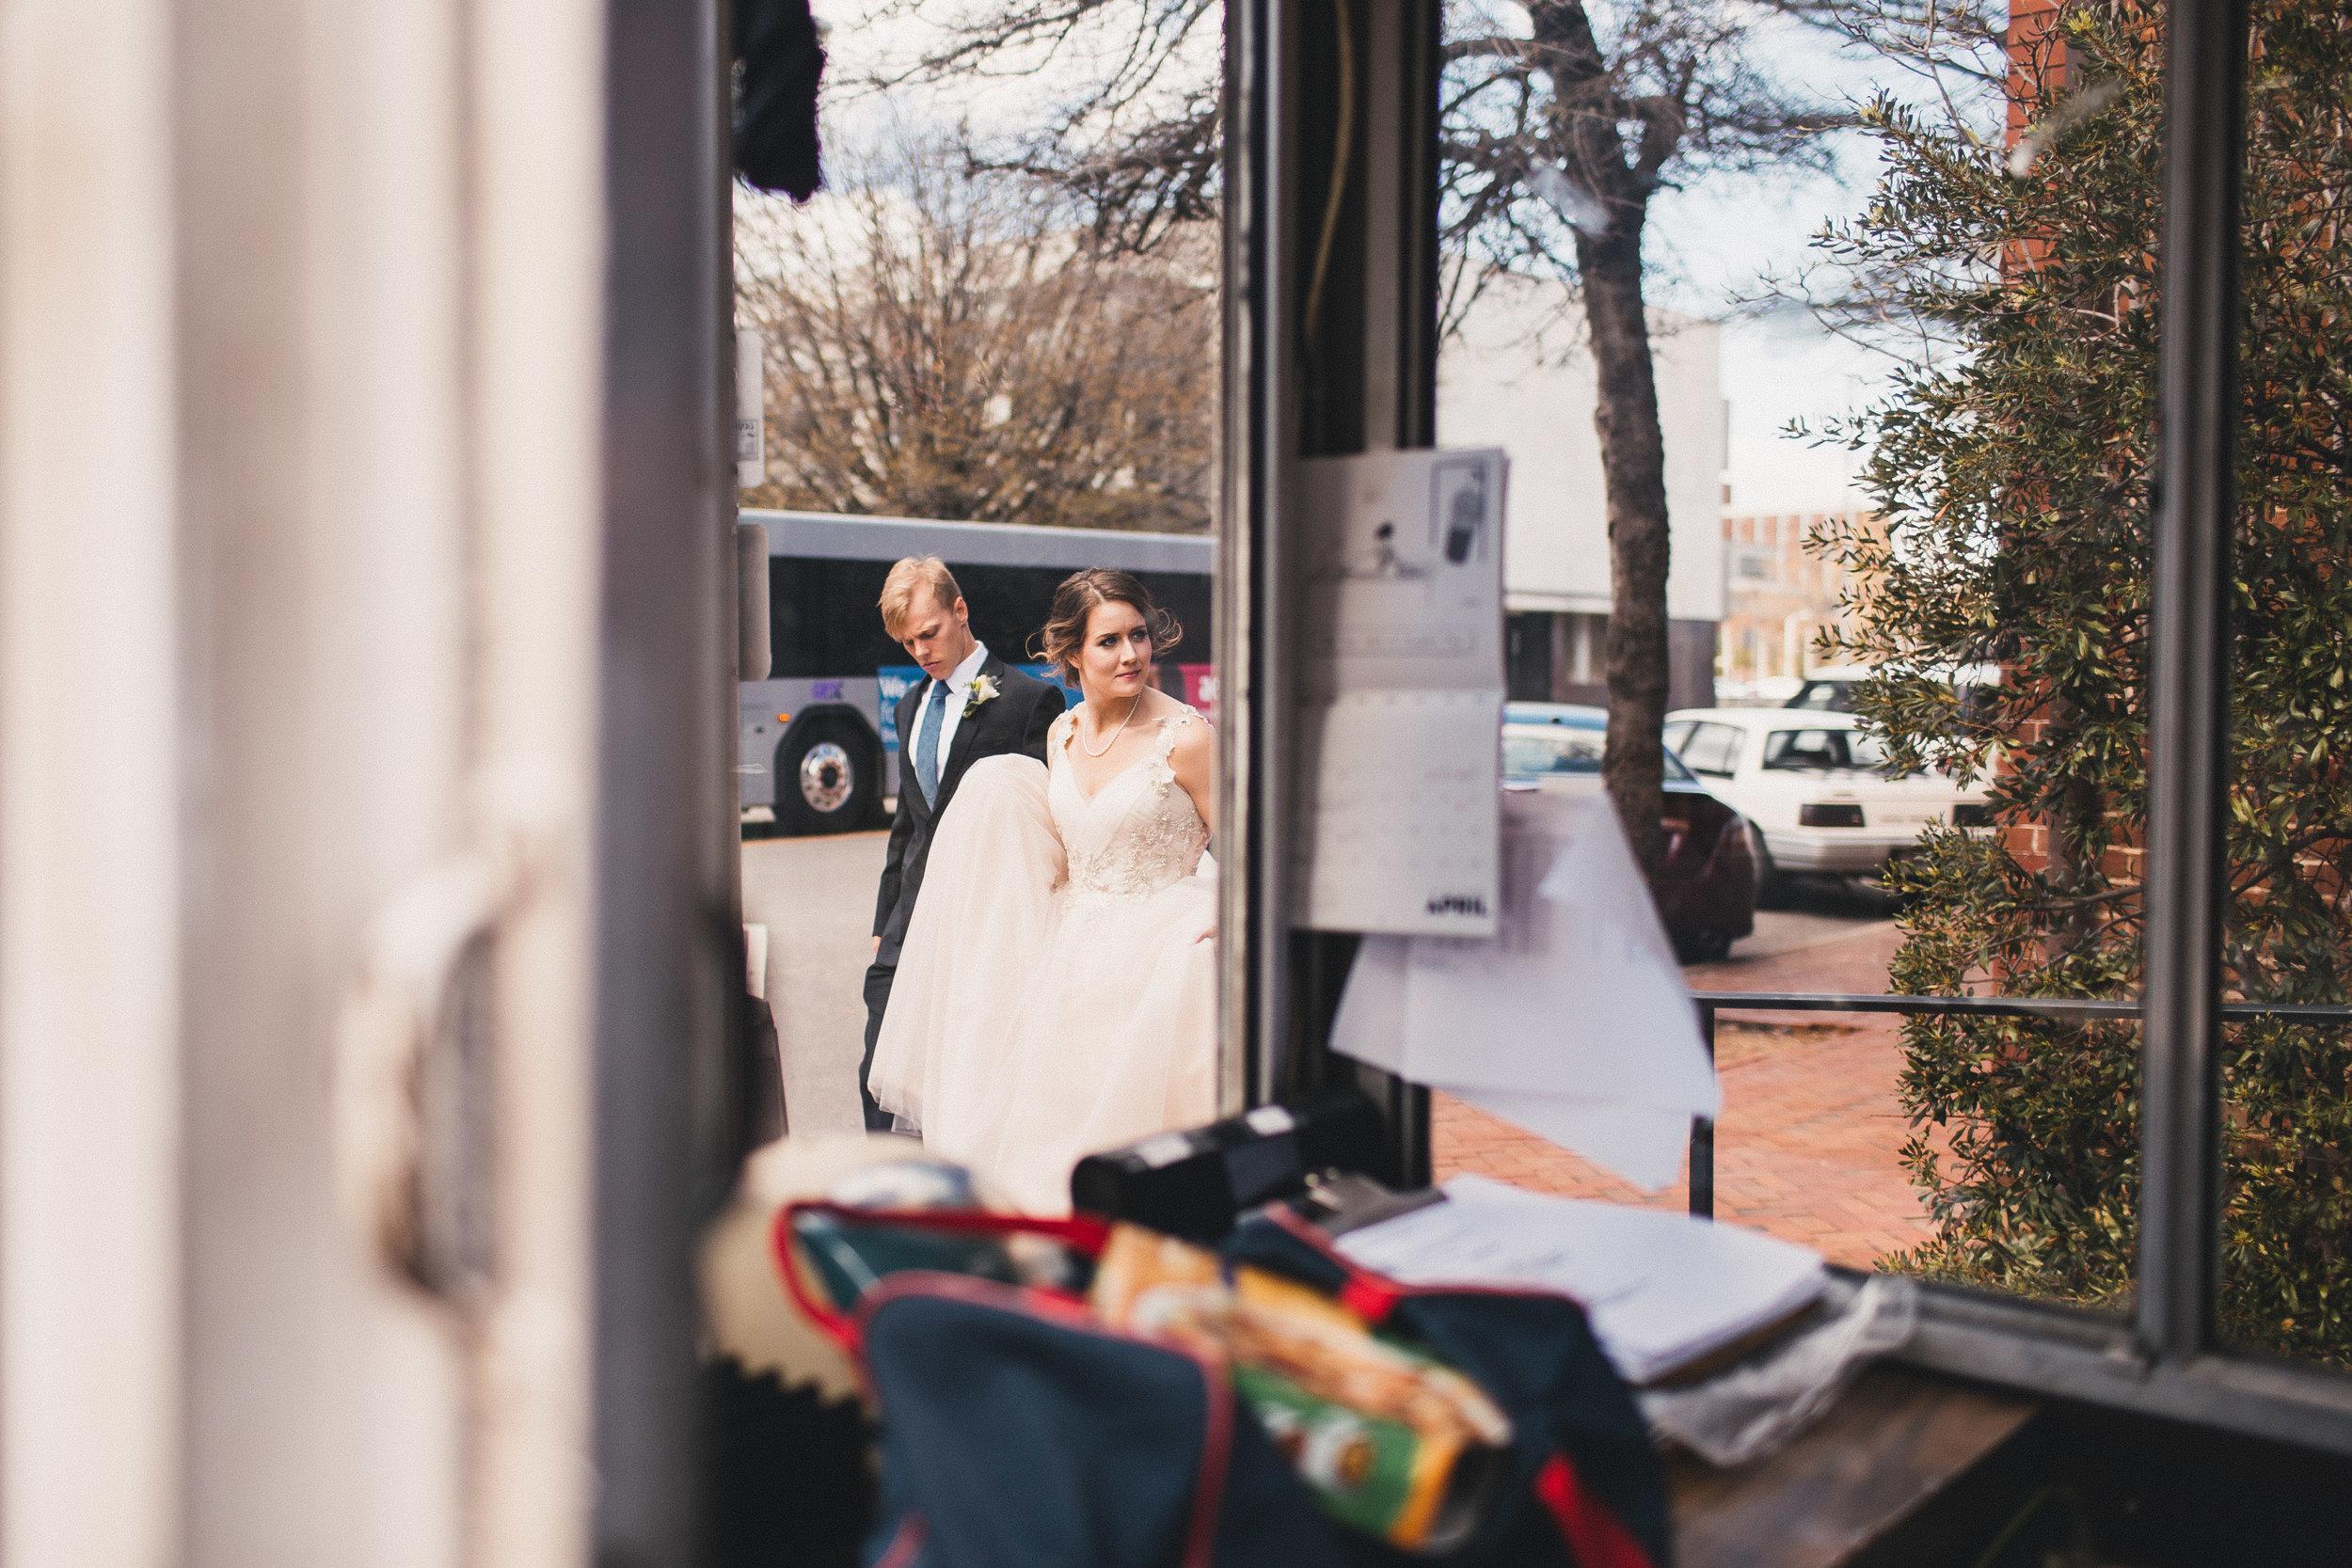 Lindsey & Bert - Wedding 4.1.17-370.jpg